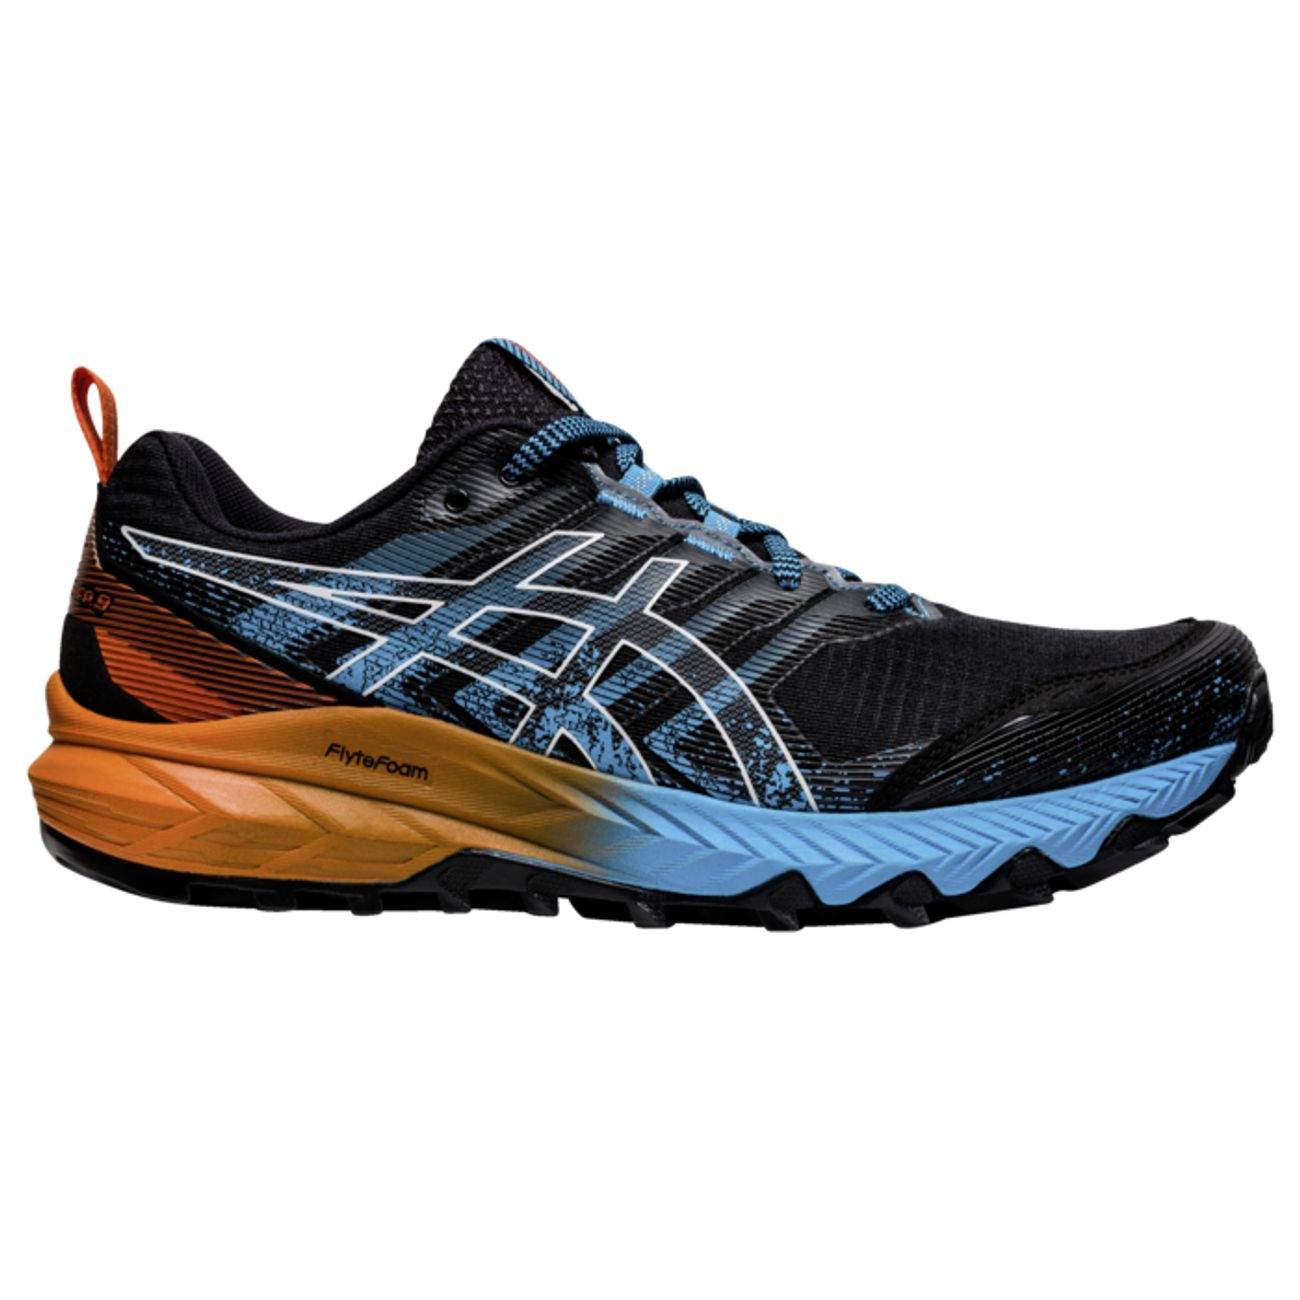 CHAUSSURES DE RUNNING running homme ASICS GEL-TRABUCO 9 M